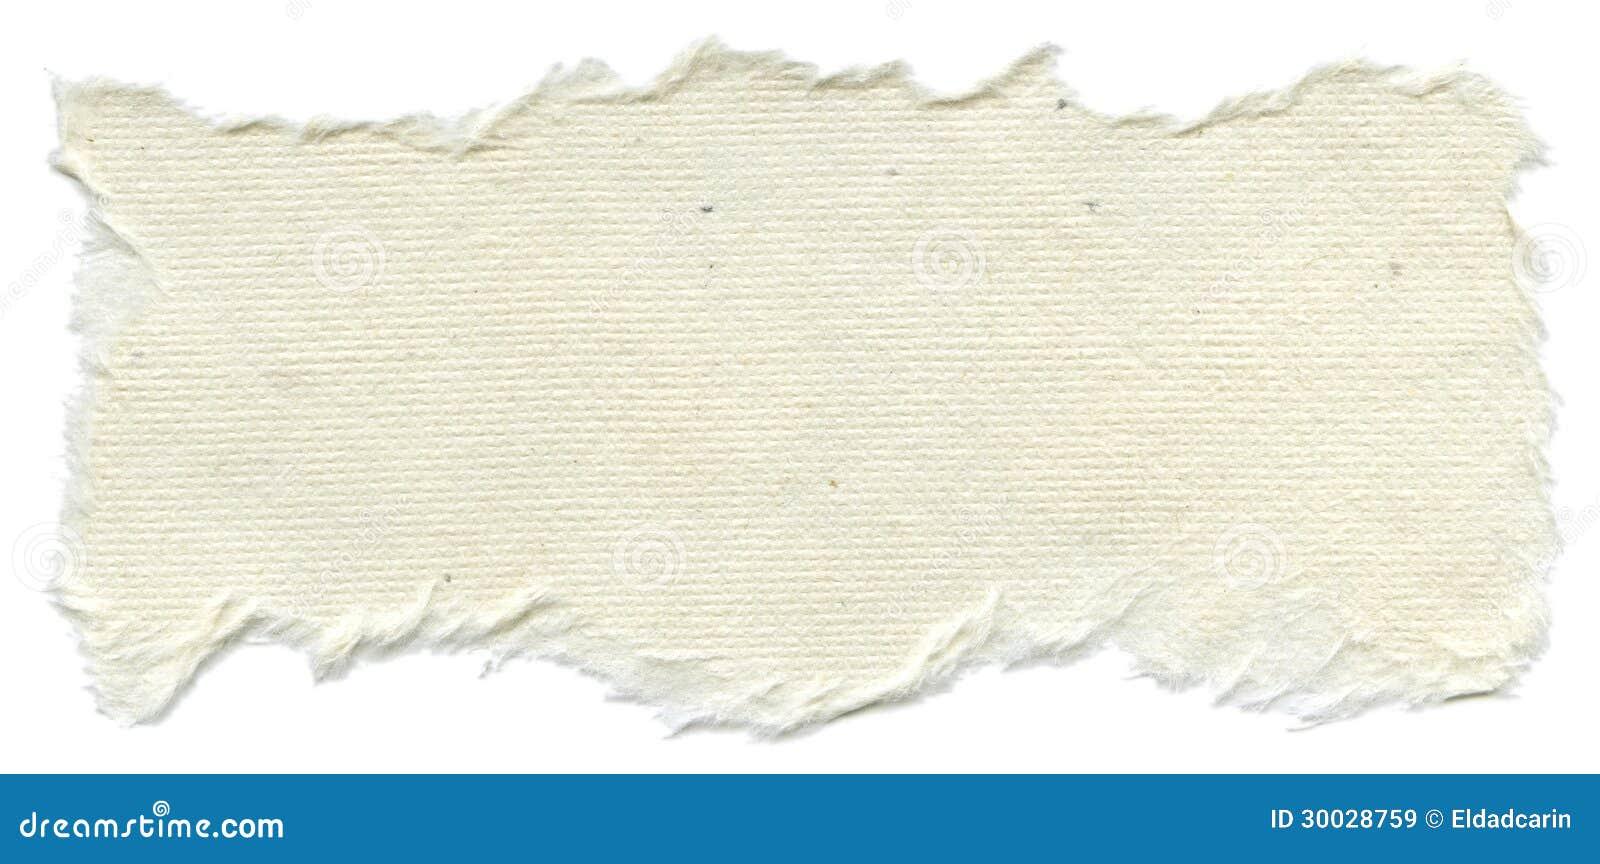 Isolated Rice Paper Texture - Cream White XXXXL